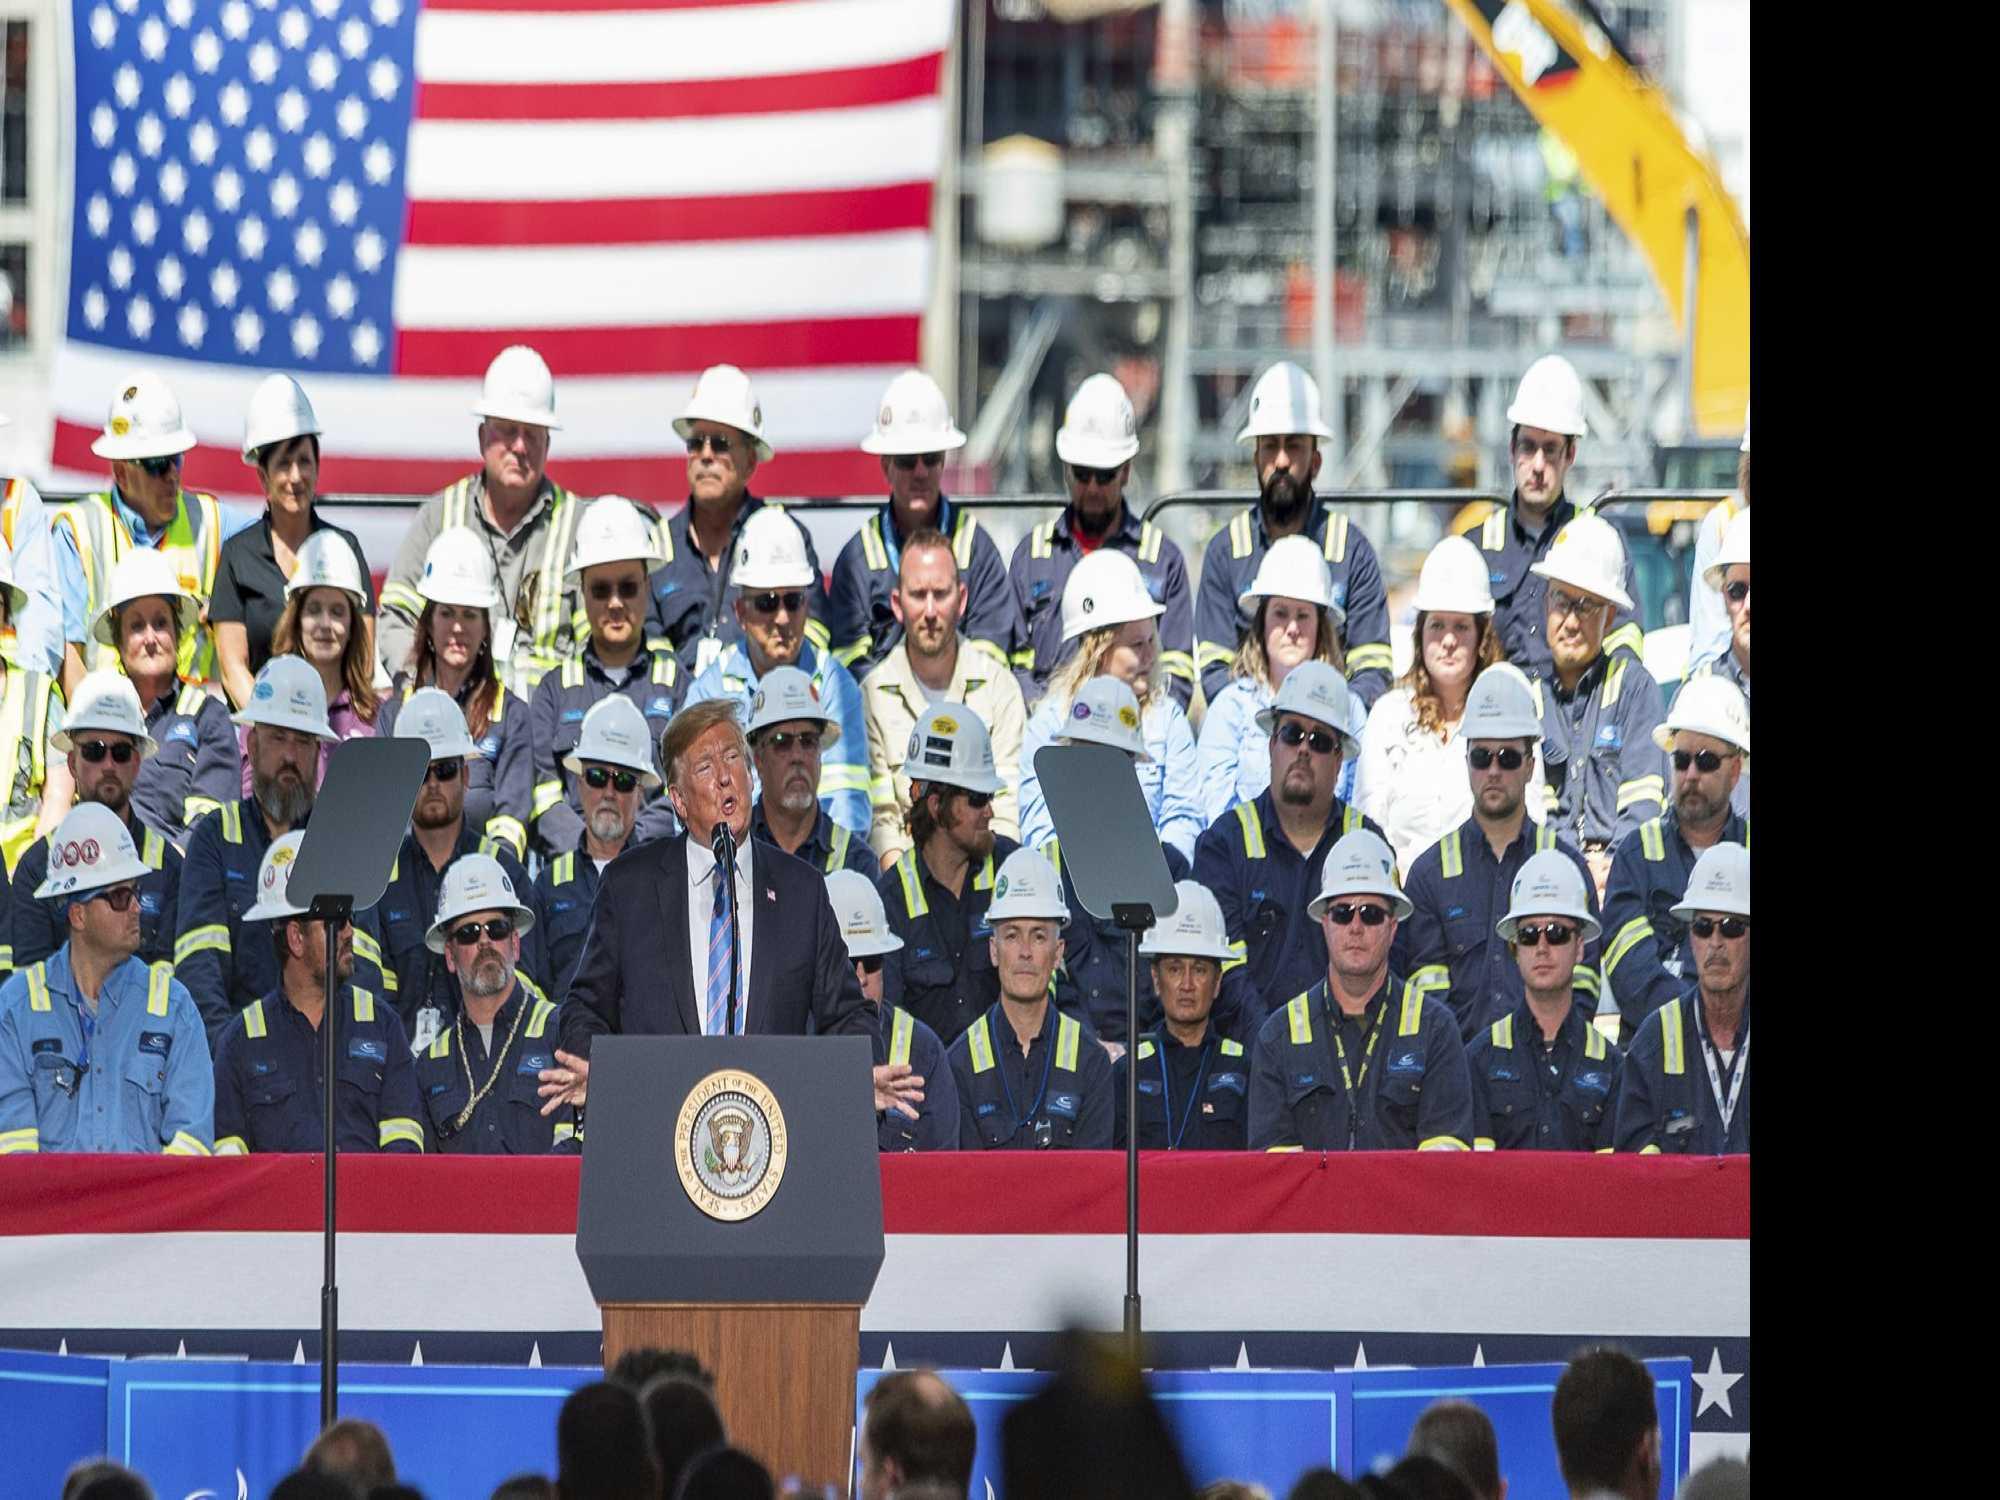 Want A Bridge? Trump Blurs Line Between Governing, Campaign